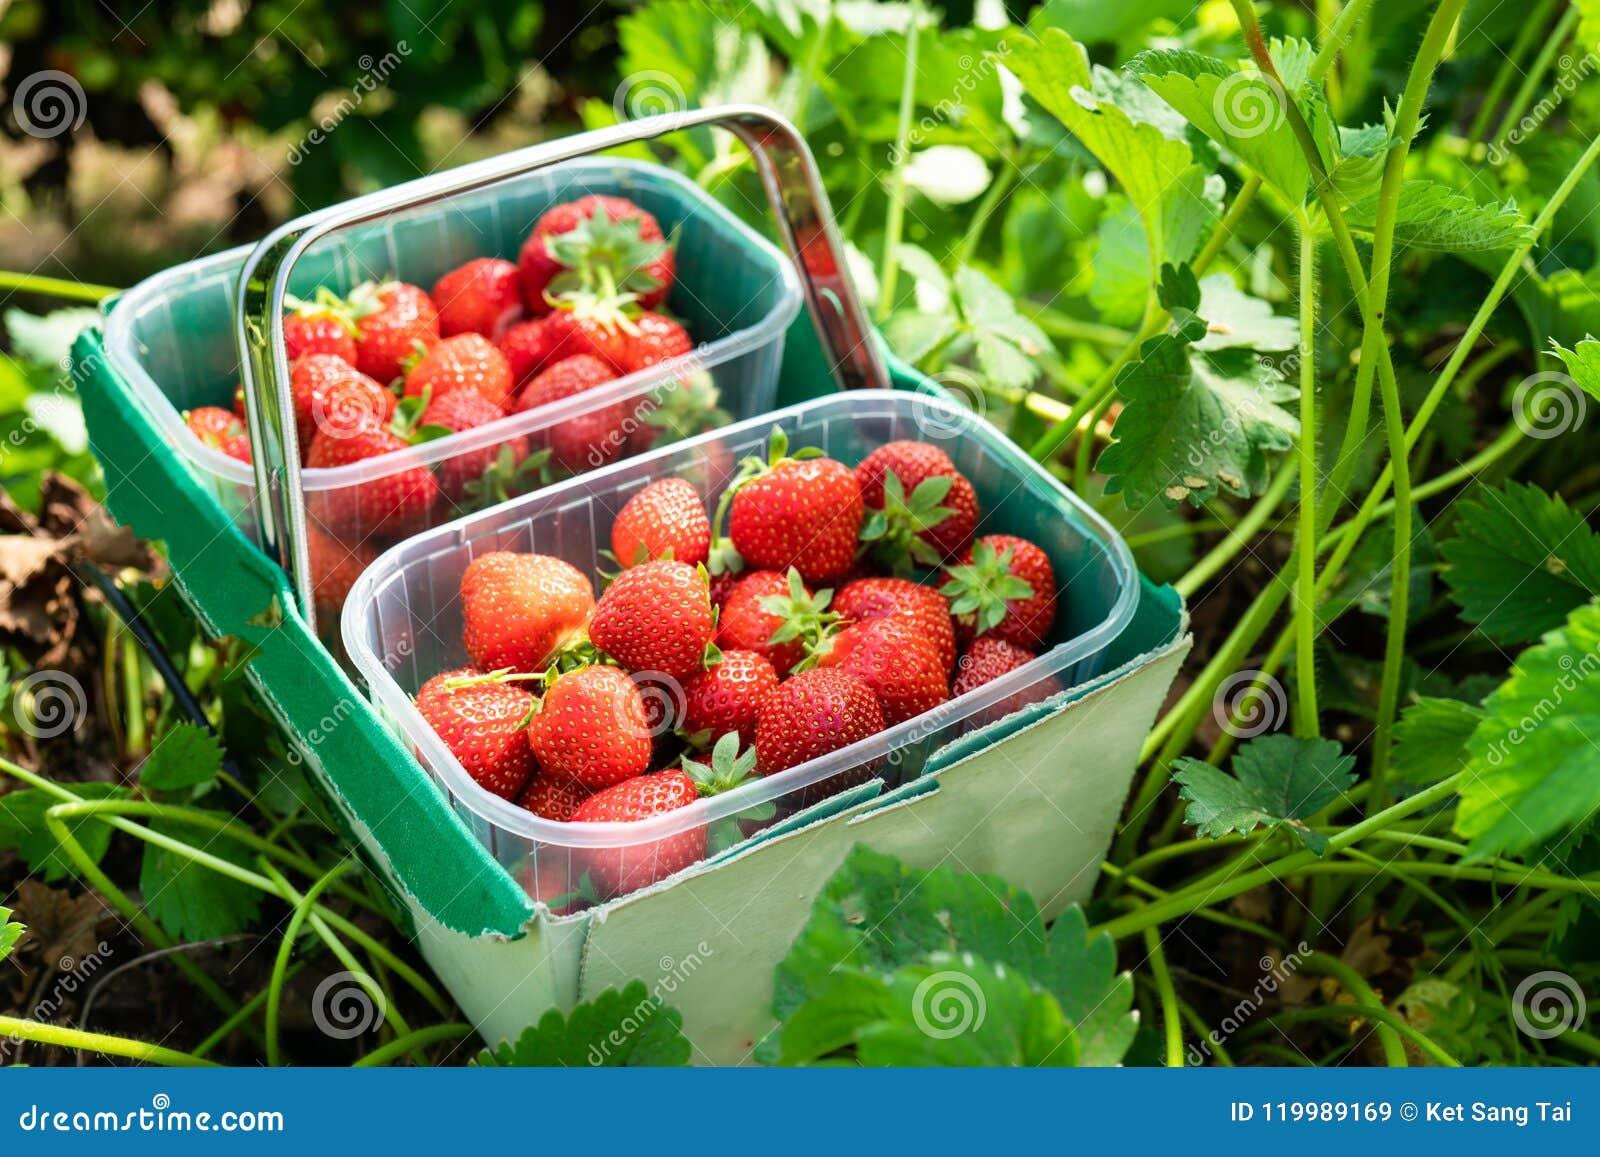 Box of Freshly Picked Strawberries